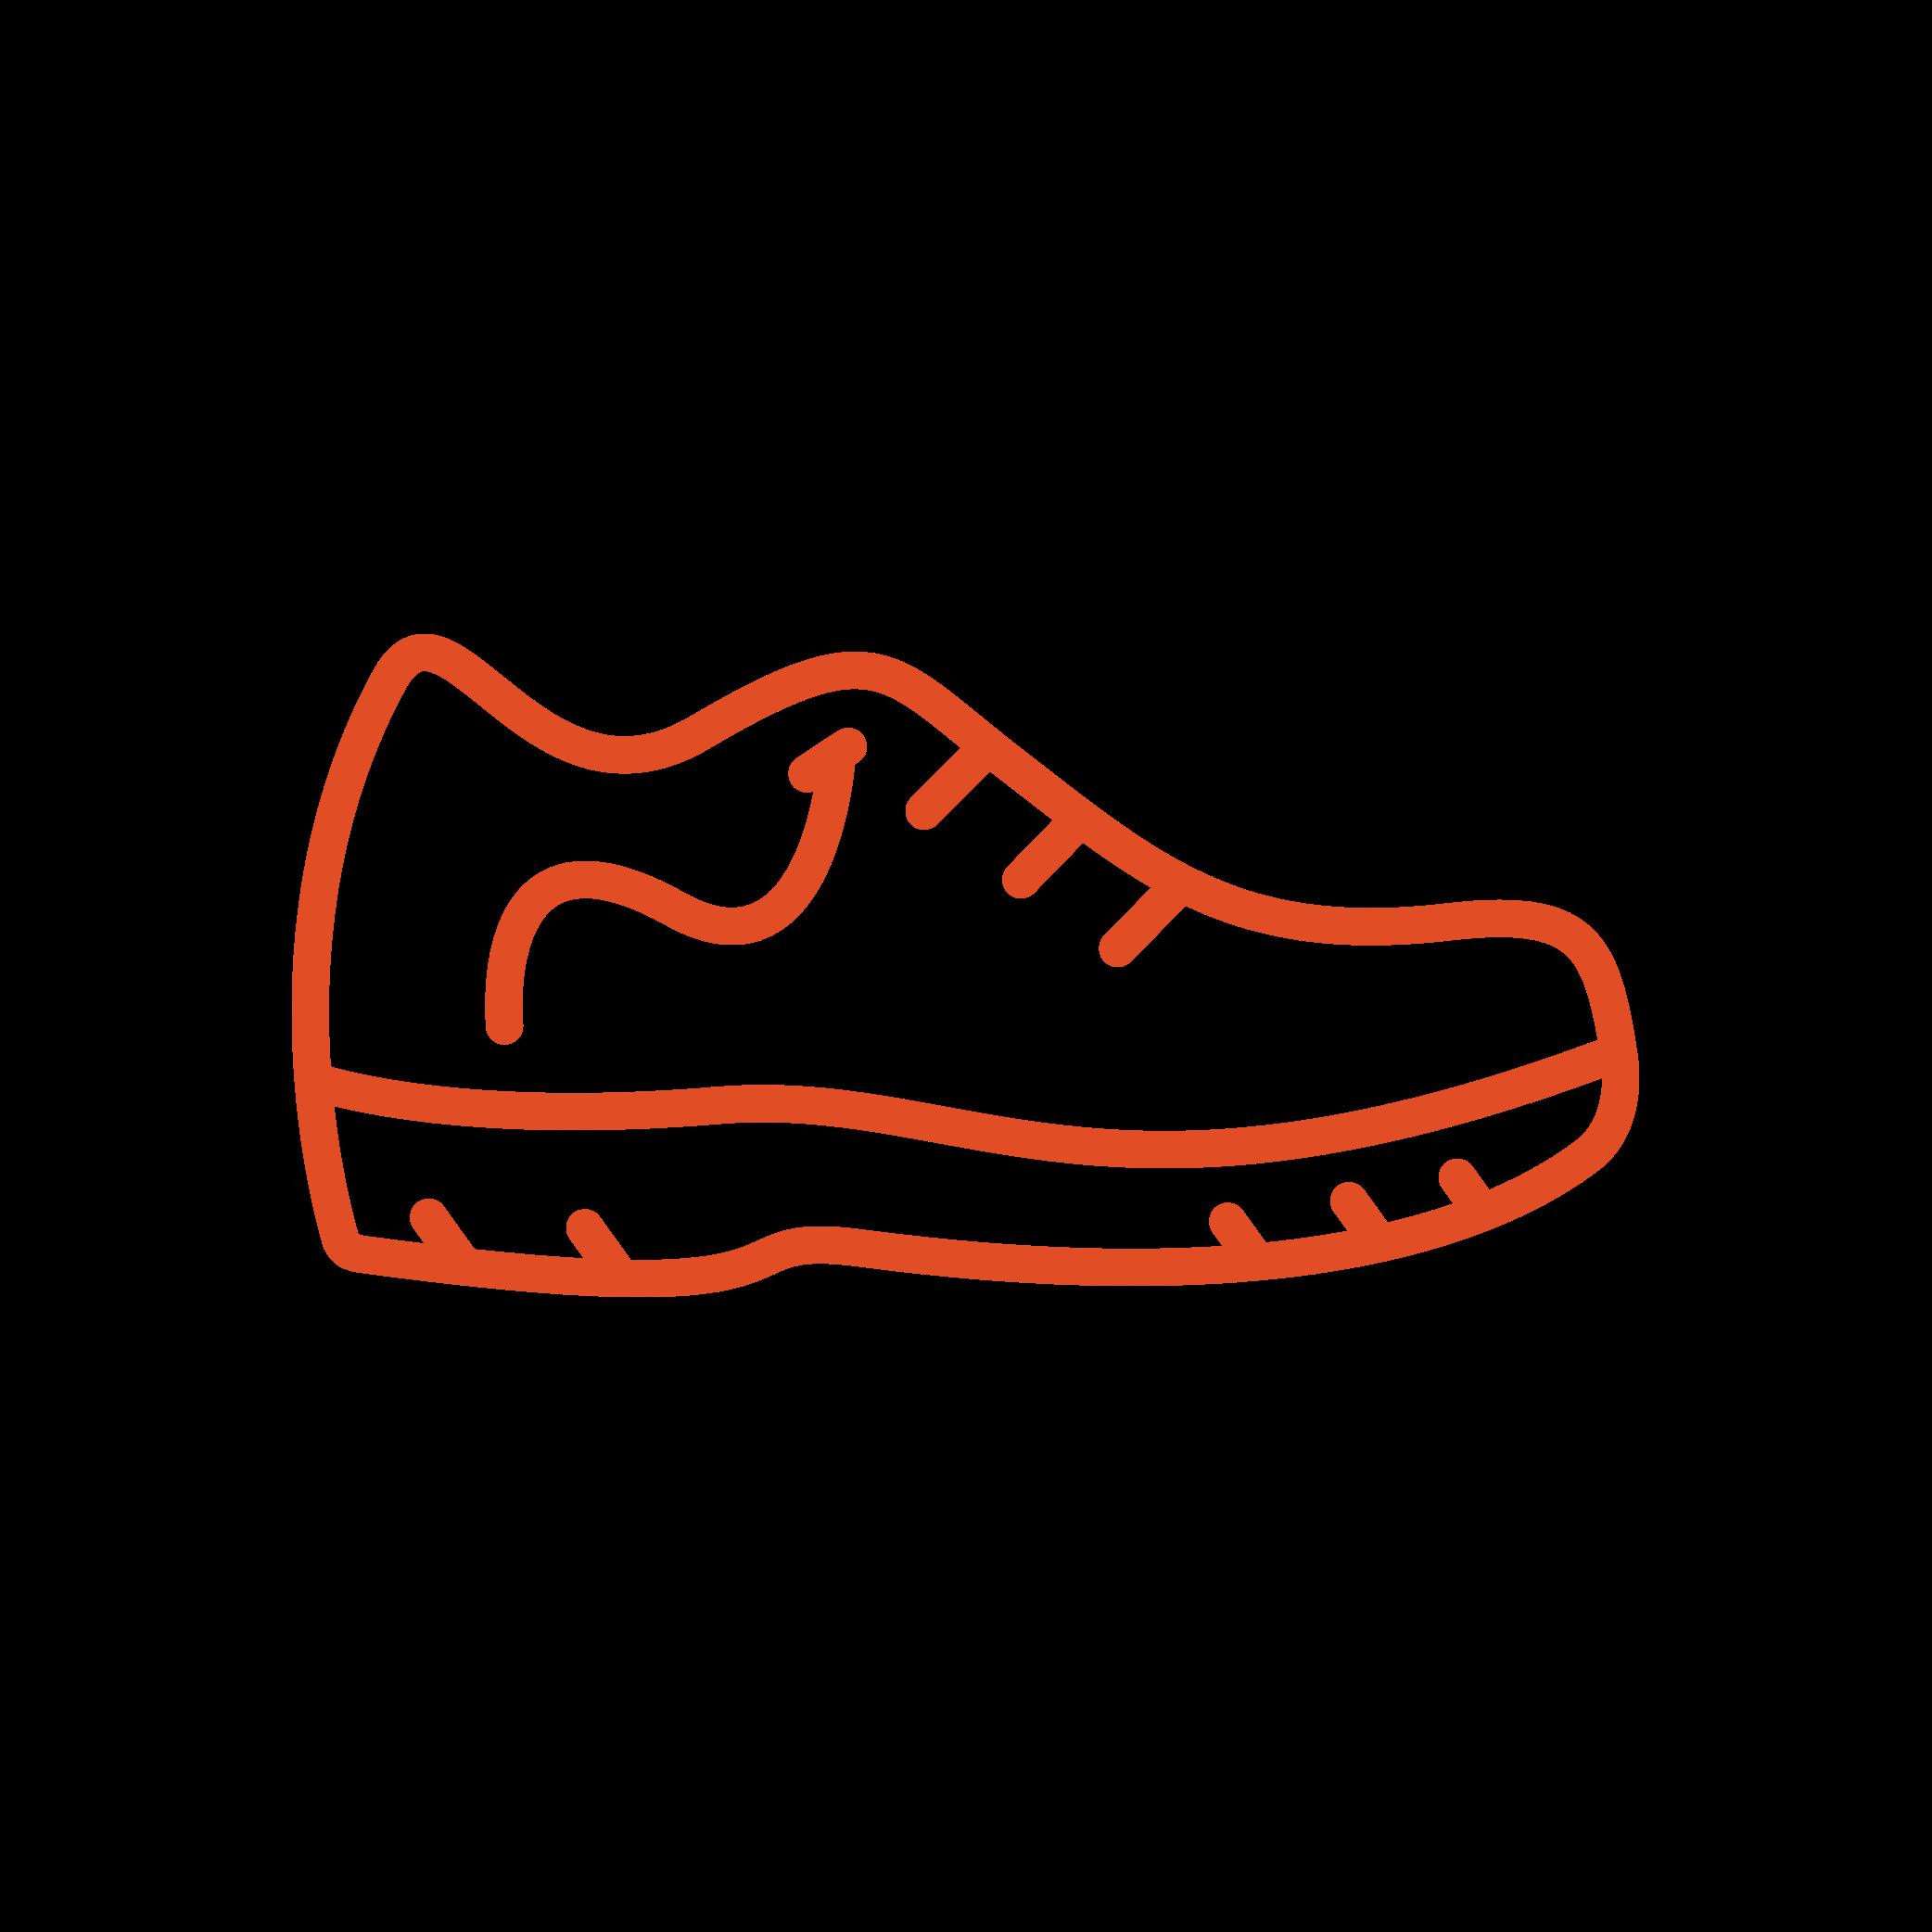 Neon-Line_shoes